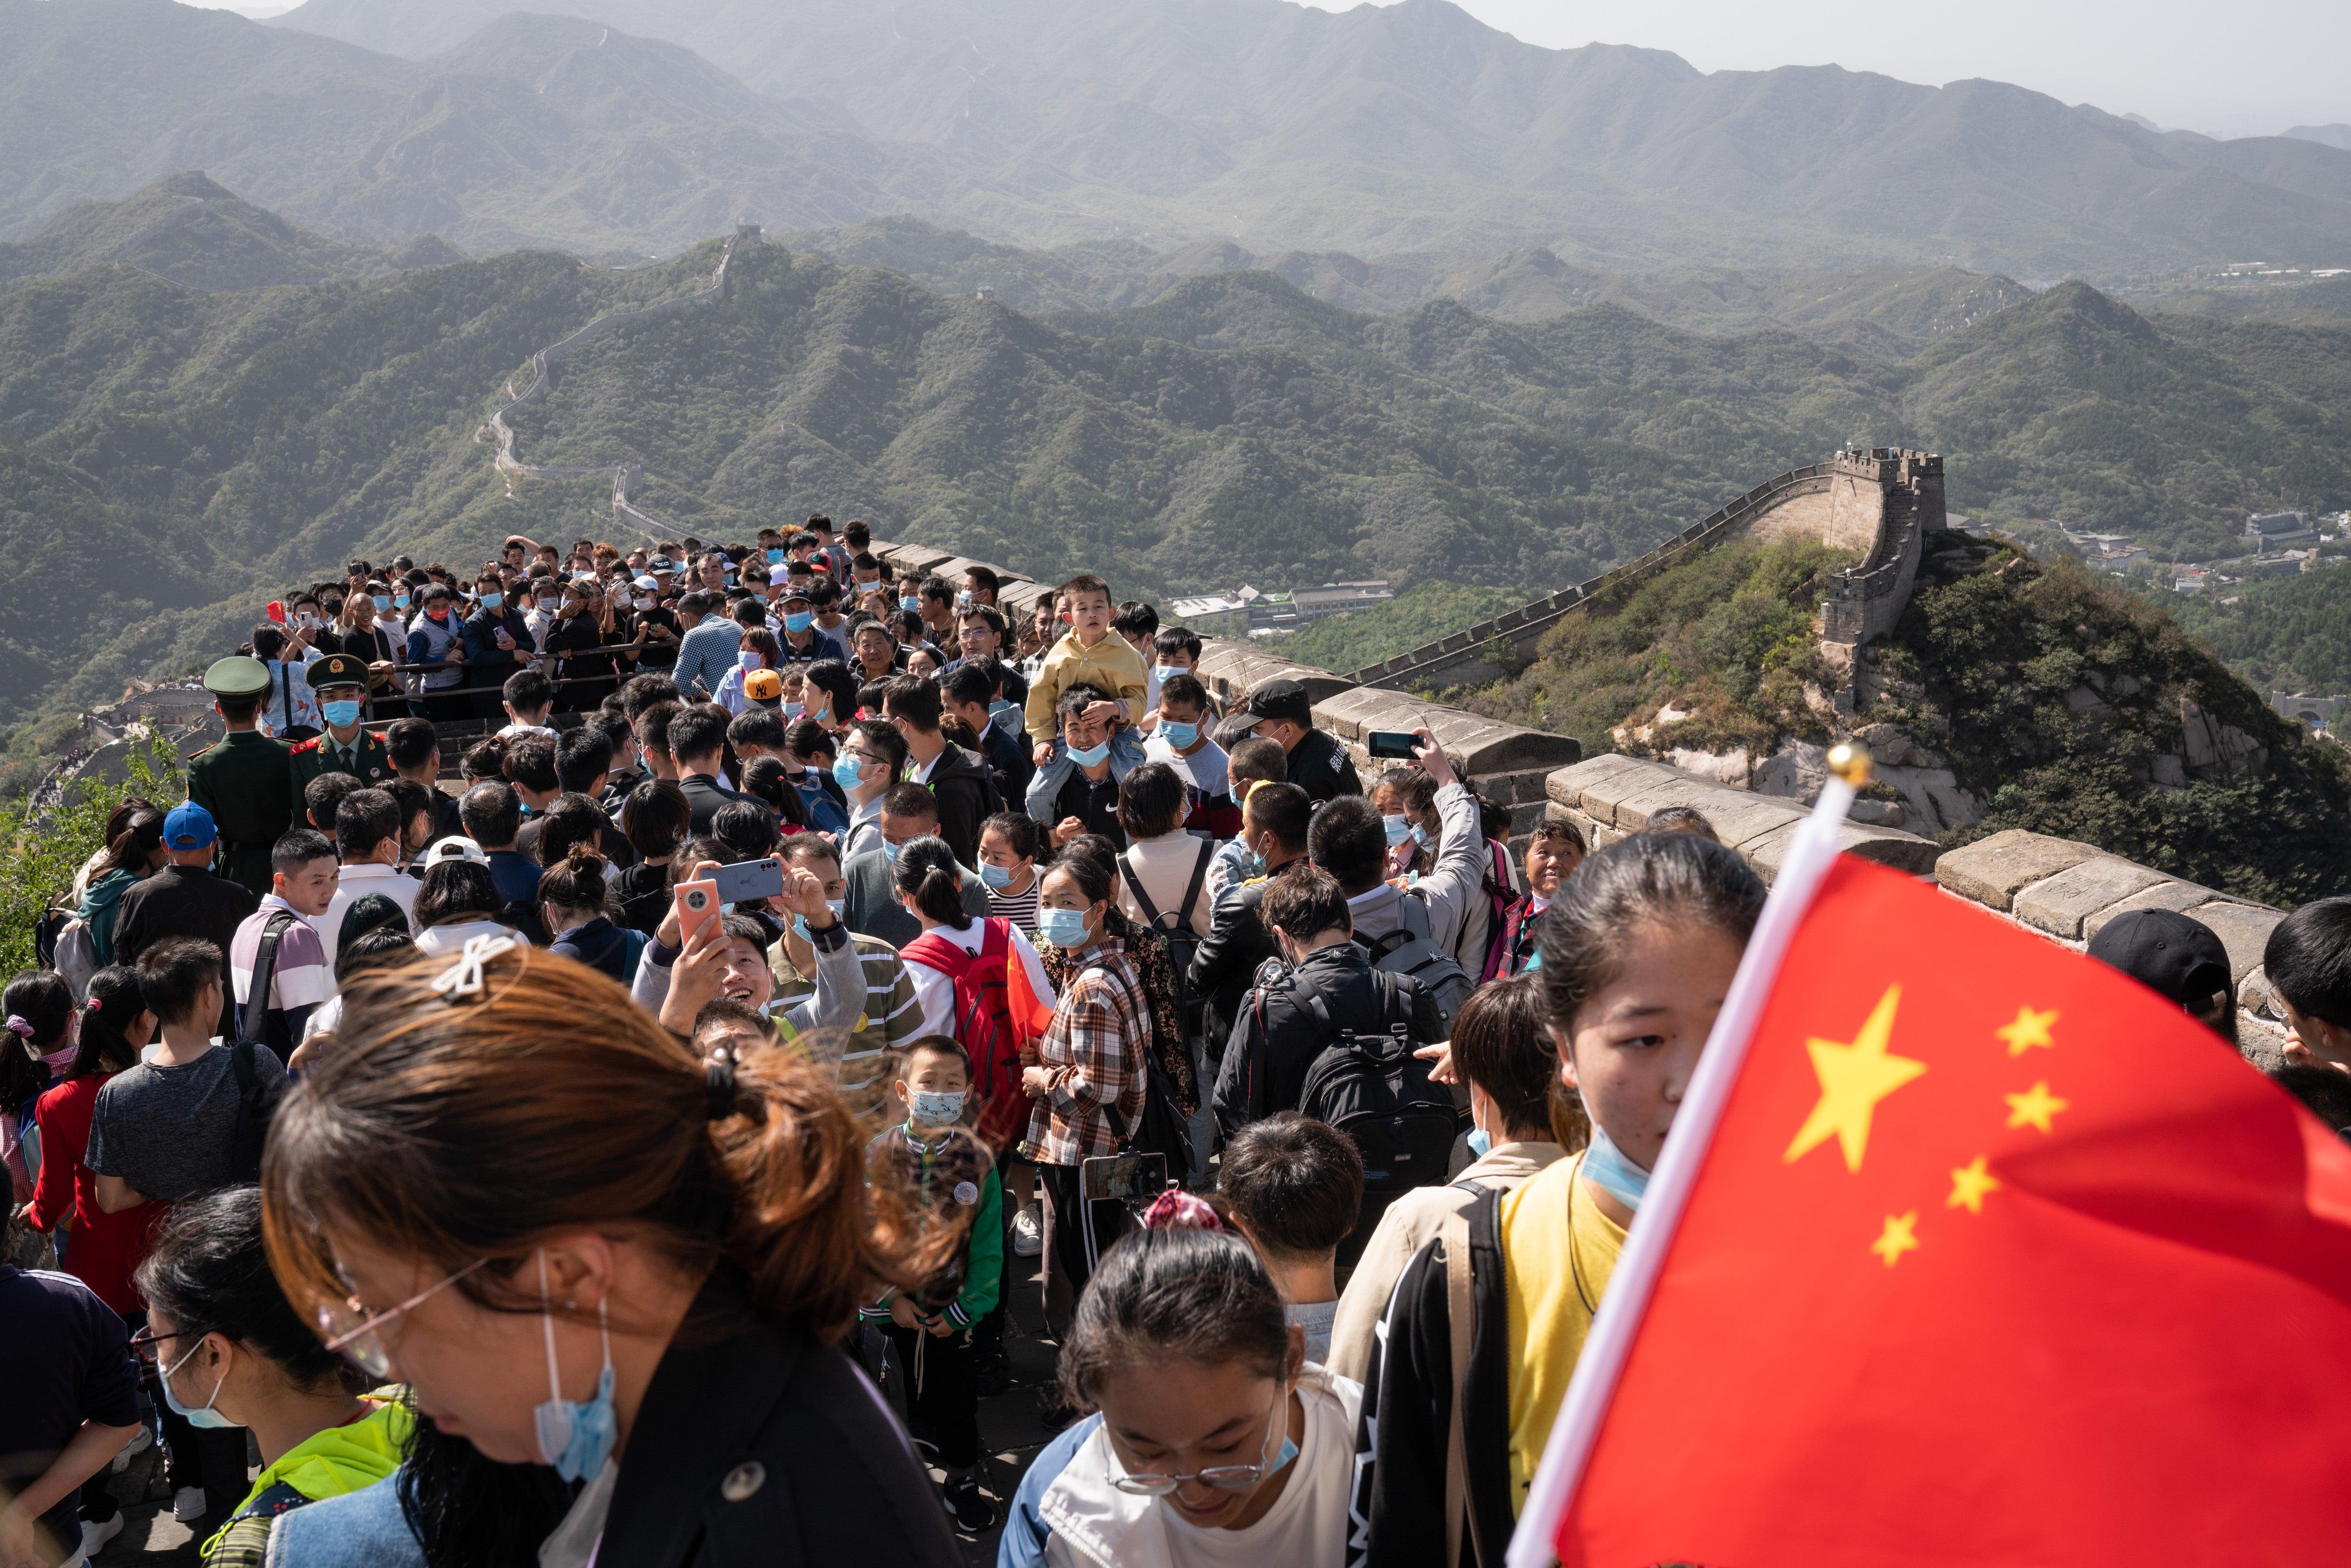 China encouraging 'revenge travel' following coronavirus lockdowns to help economy – Fox News